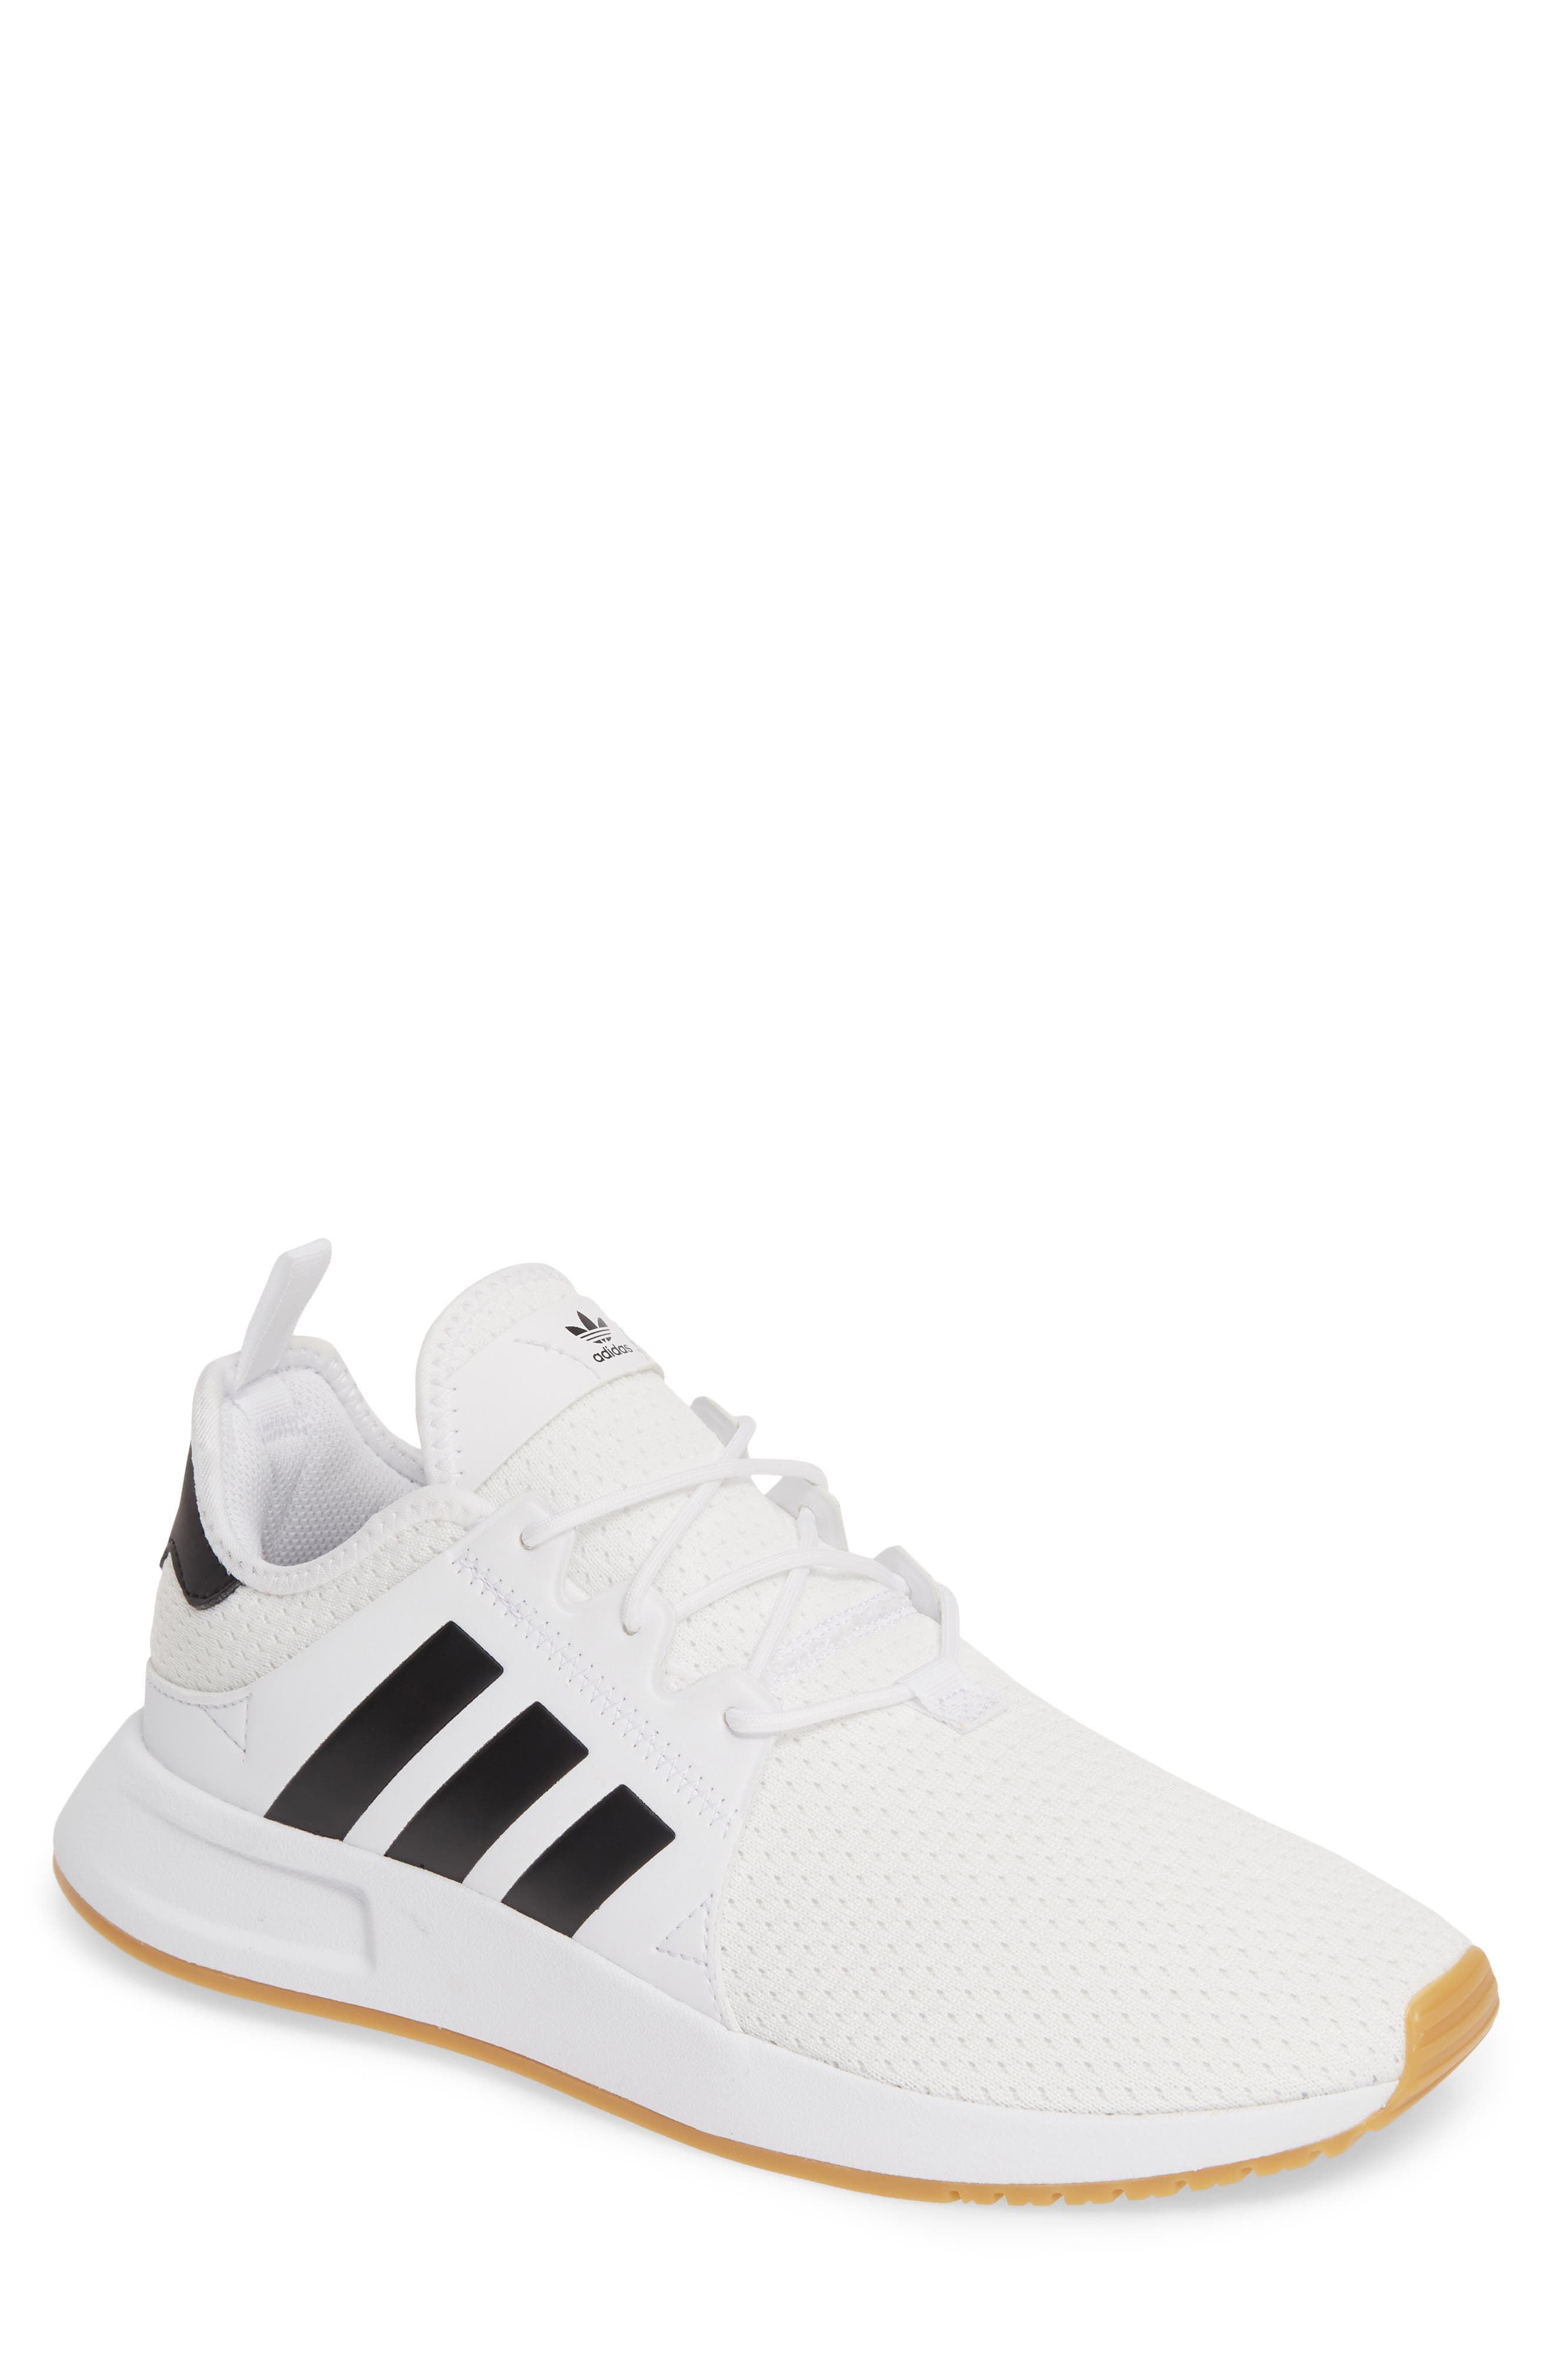 X_PLR Sneaker, Main, color, WHITE/ CORE BLACK/ GUM